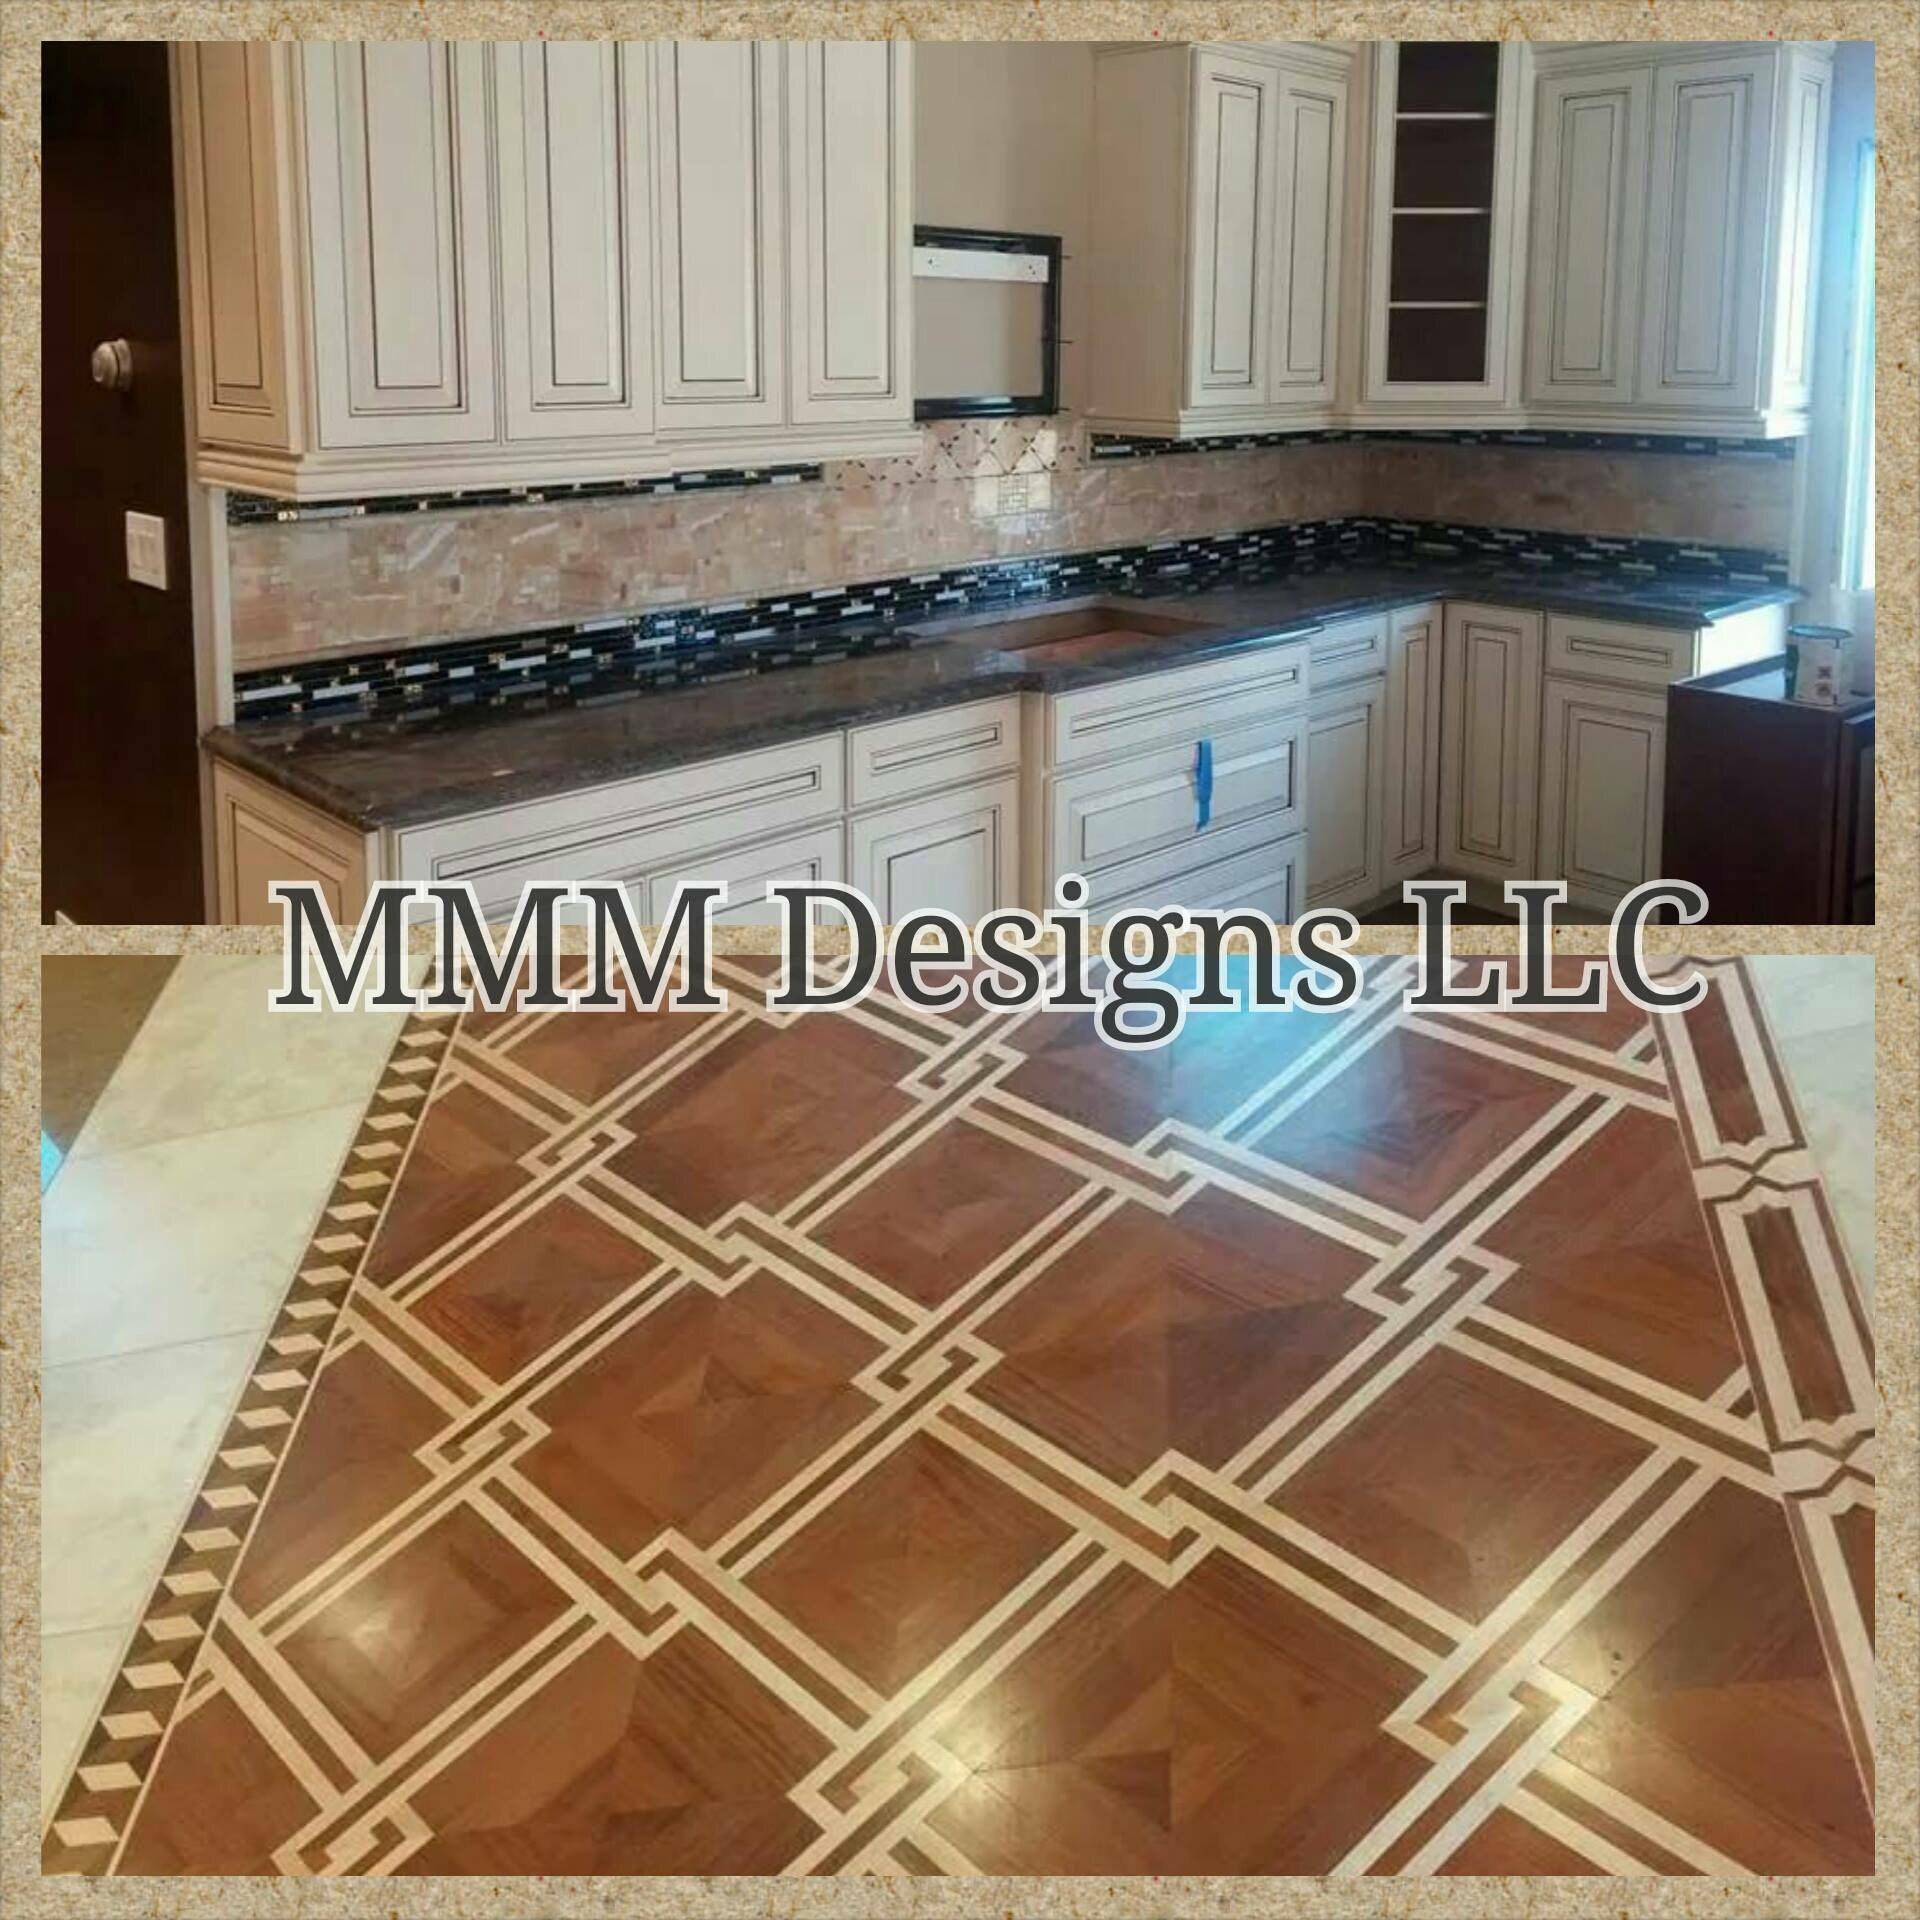 MMM Designs Reviews - Sarasota, FL